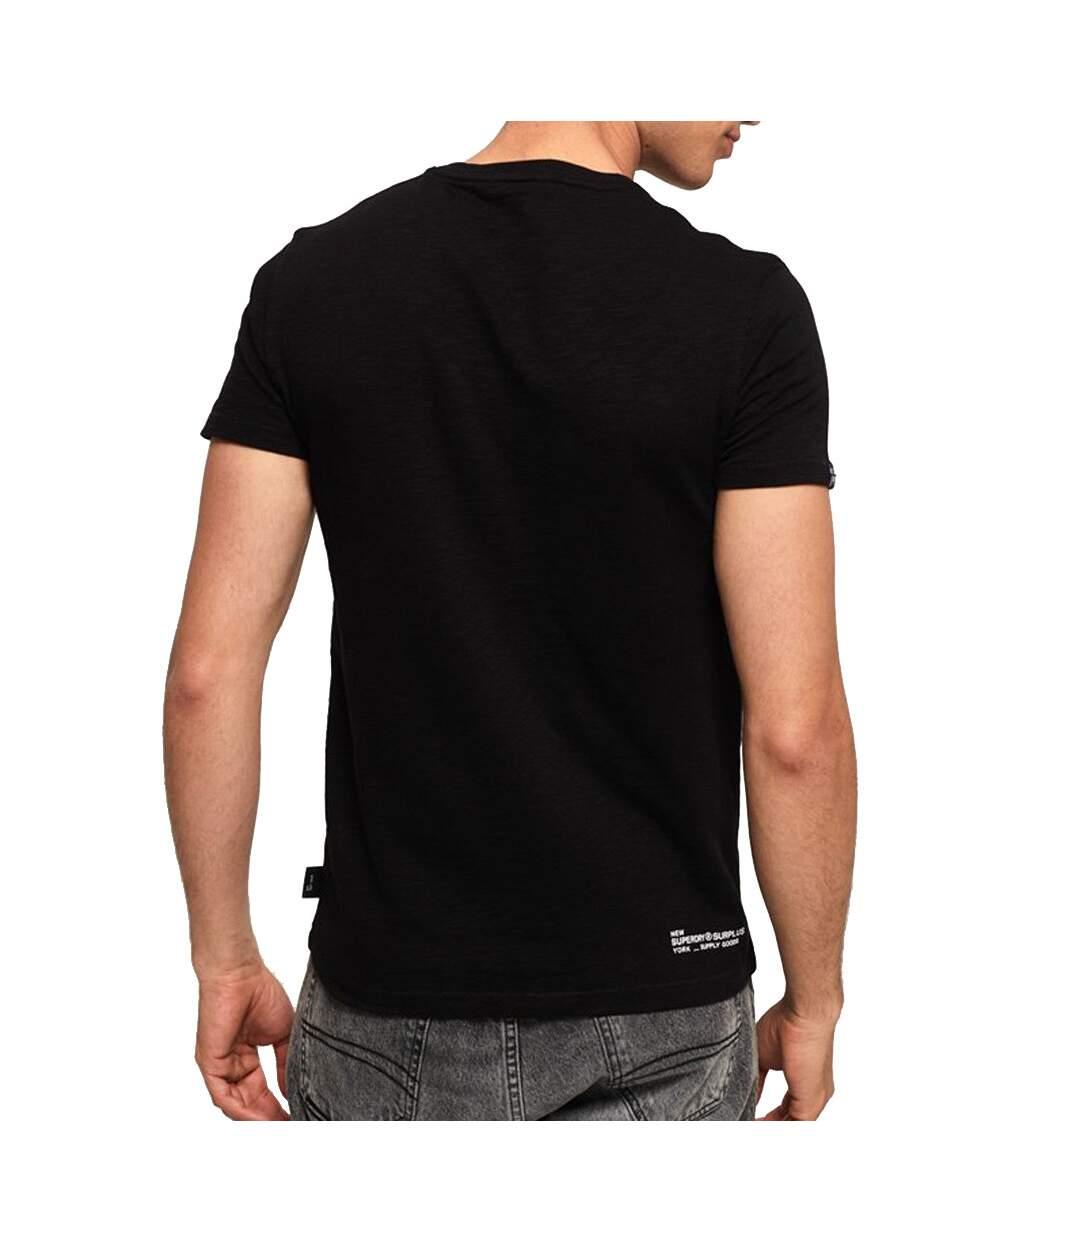 T-Shirt noir homme Superdry Surplus Goods Classic Graphic Tee